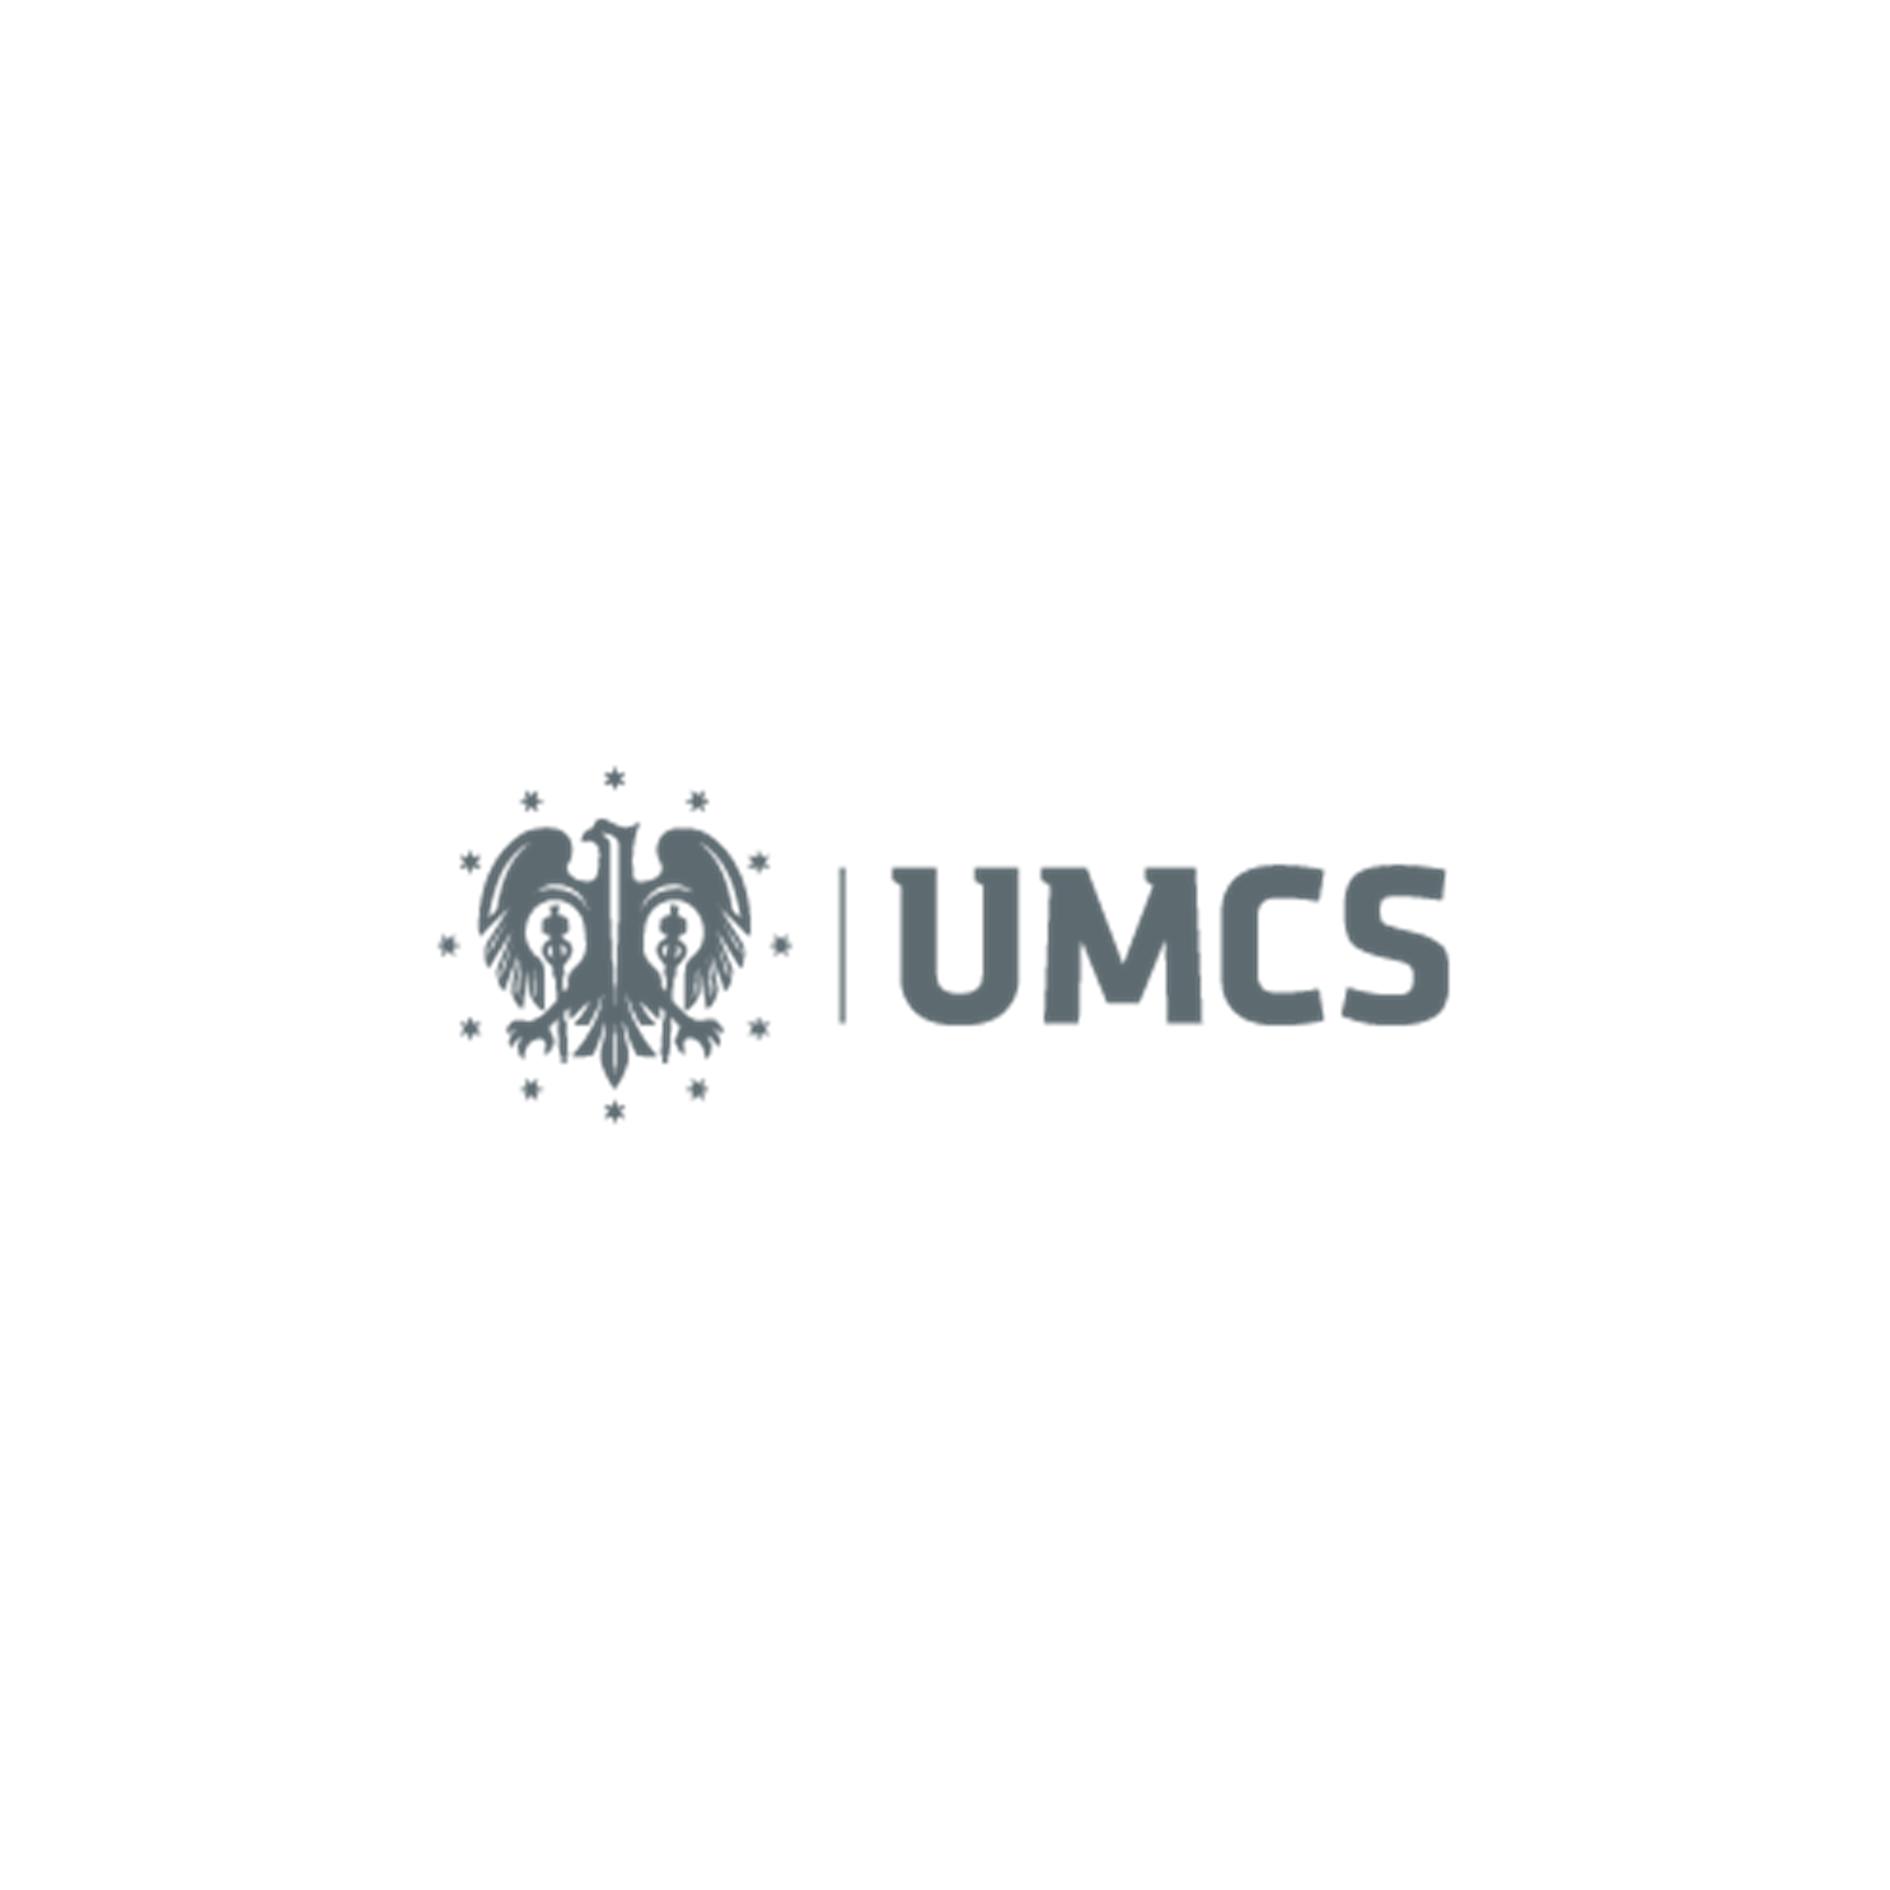 Maria Curie Skłodowska University in Lublin - UMCS